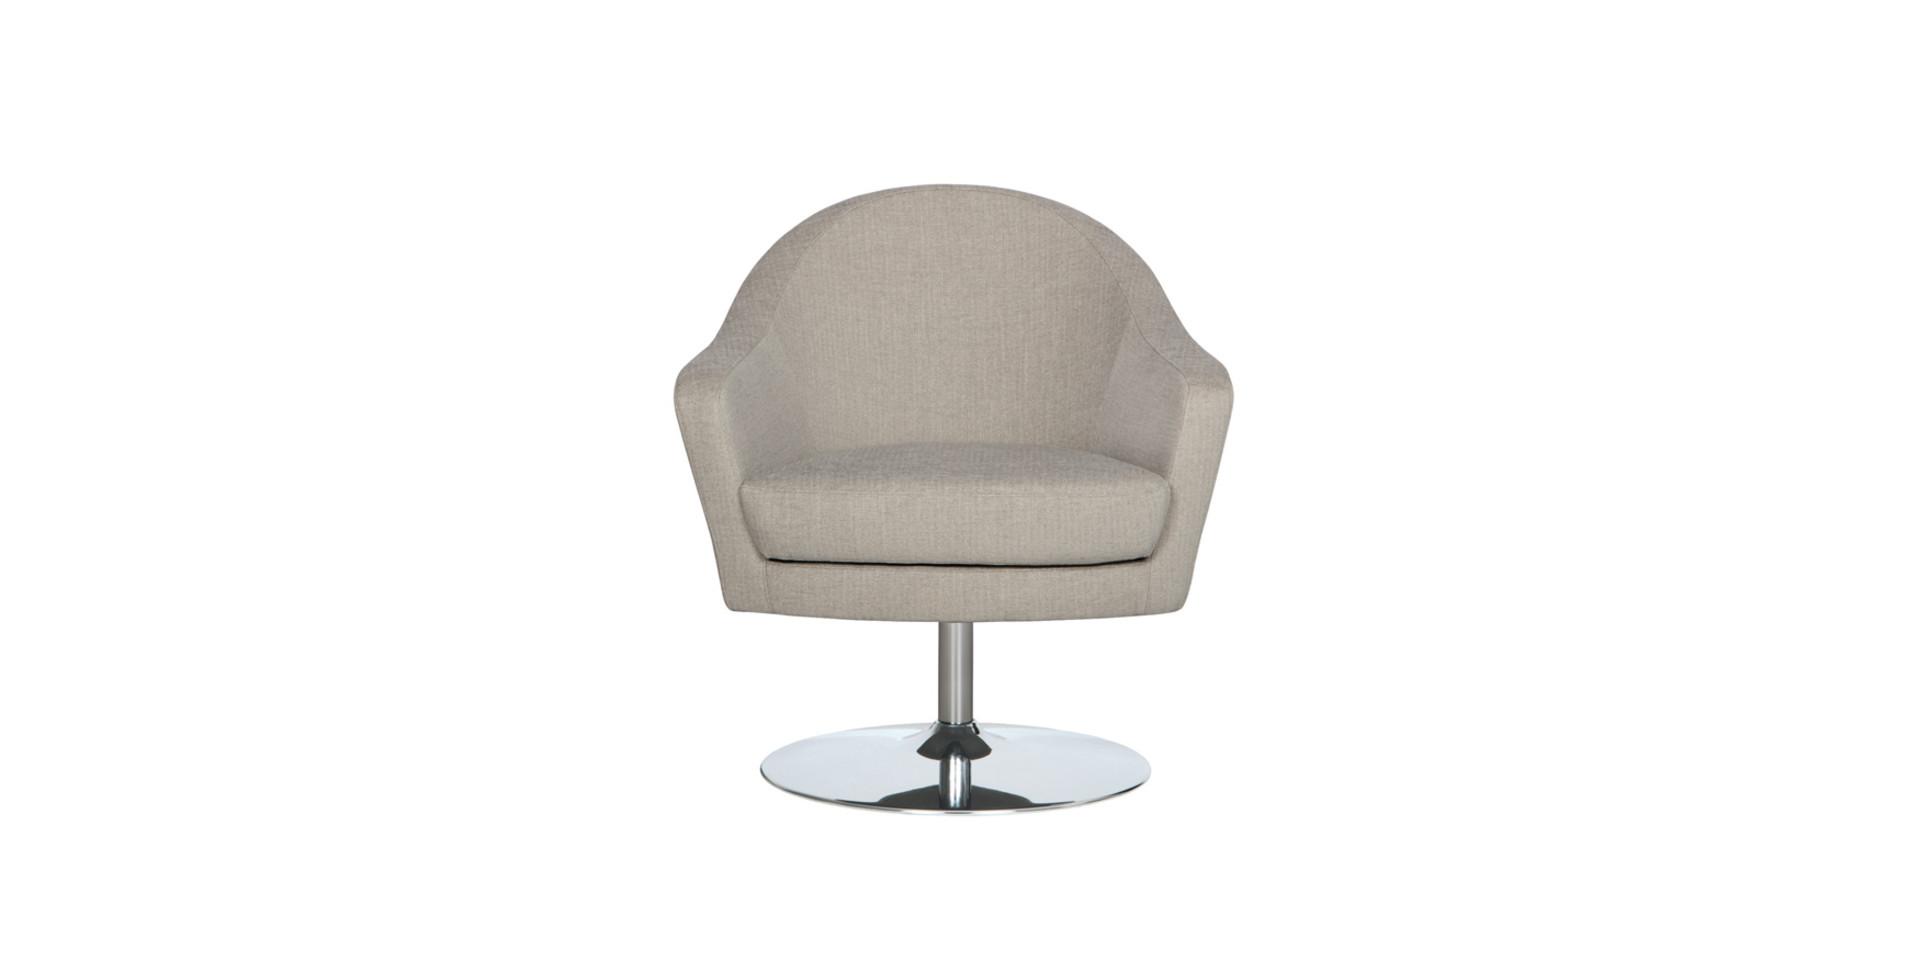 SHELL_armchair_swivel_flossy6_light_grey_1